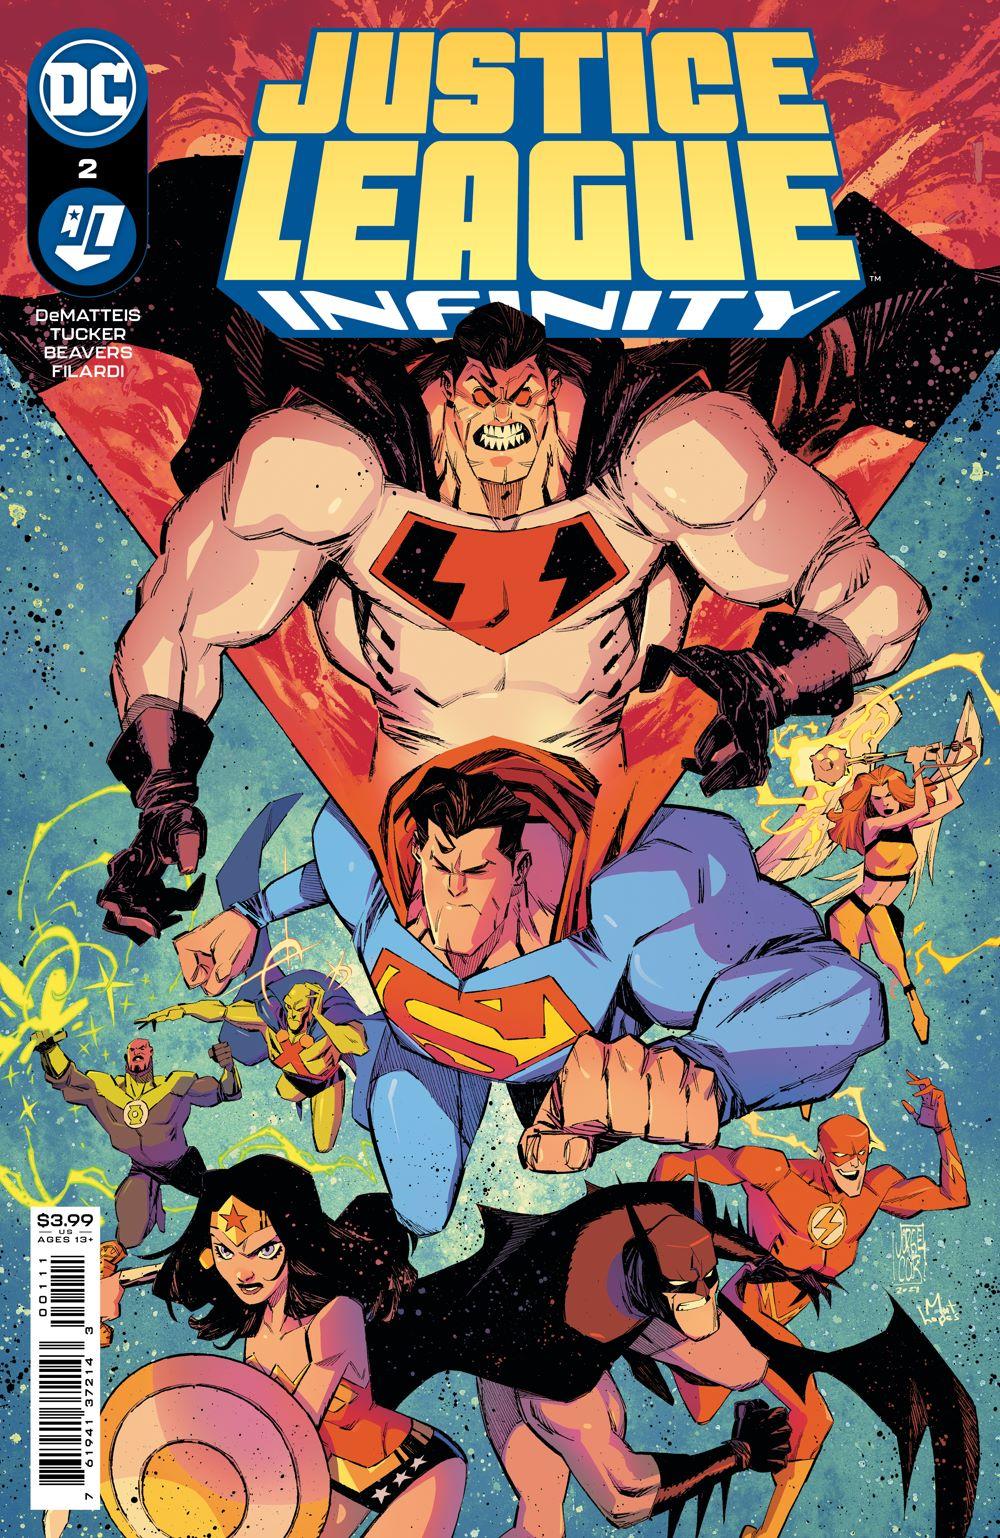 JLINFINITY_Cv2 DC Comics August 2021 Solicitations